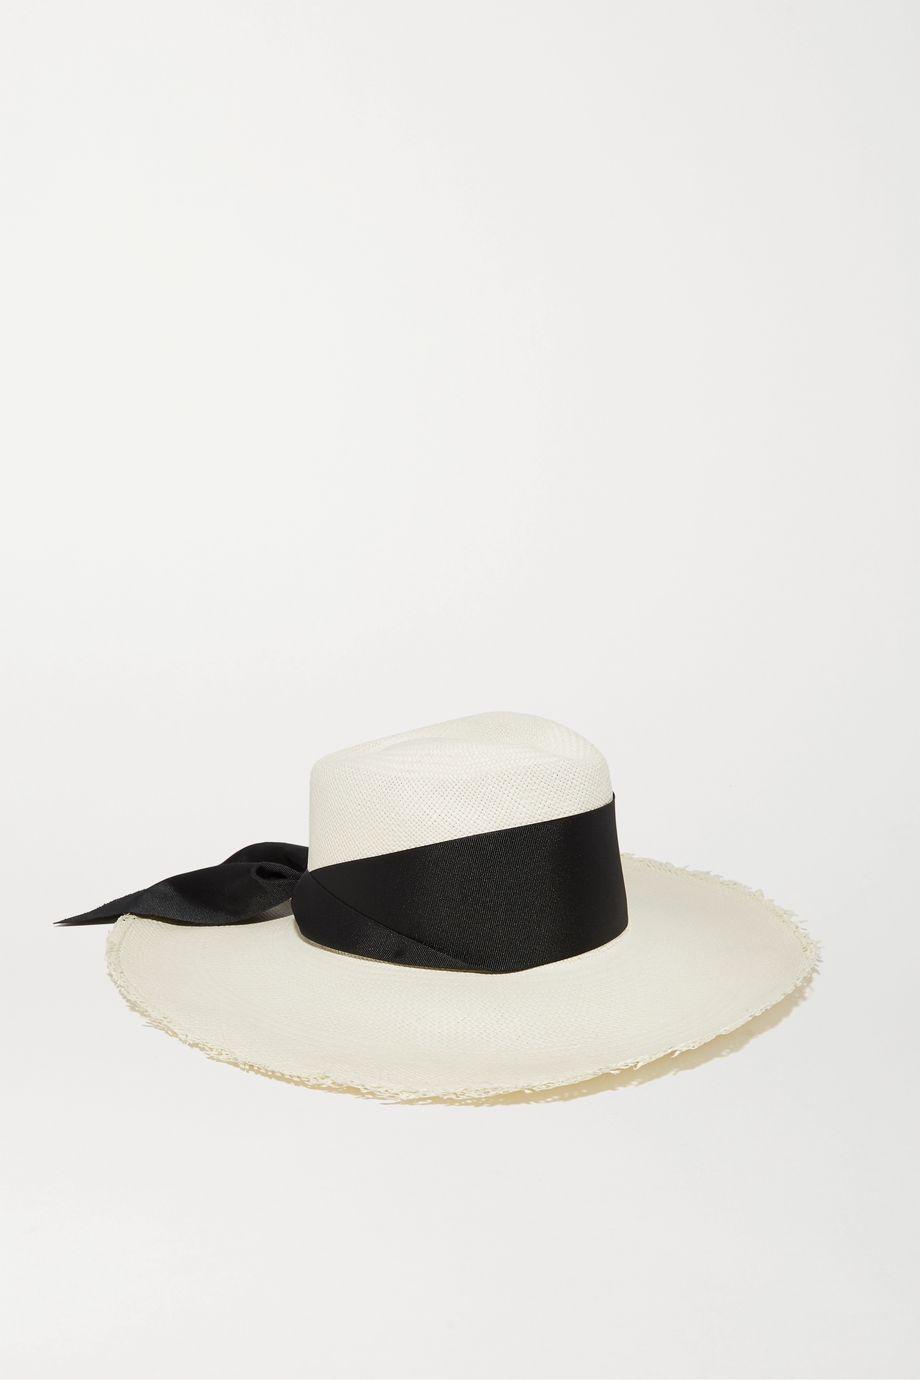 Sensi Studio Grosgrain-trimmed frayed toquilla straw Panama hat